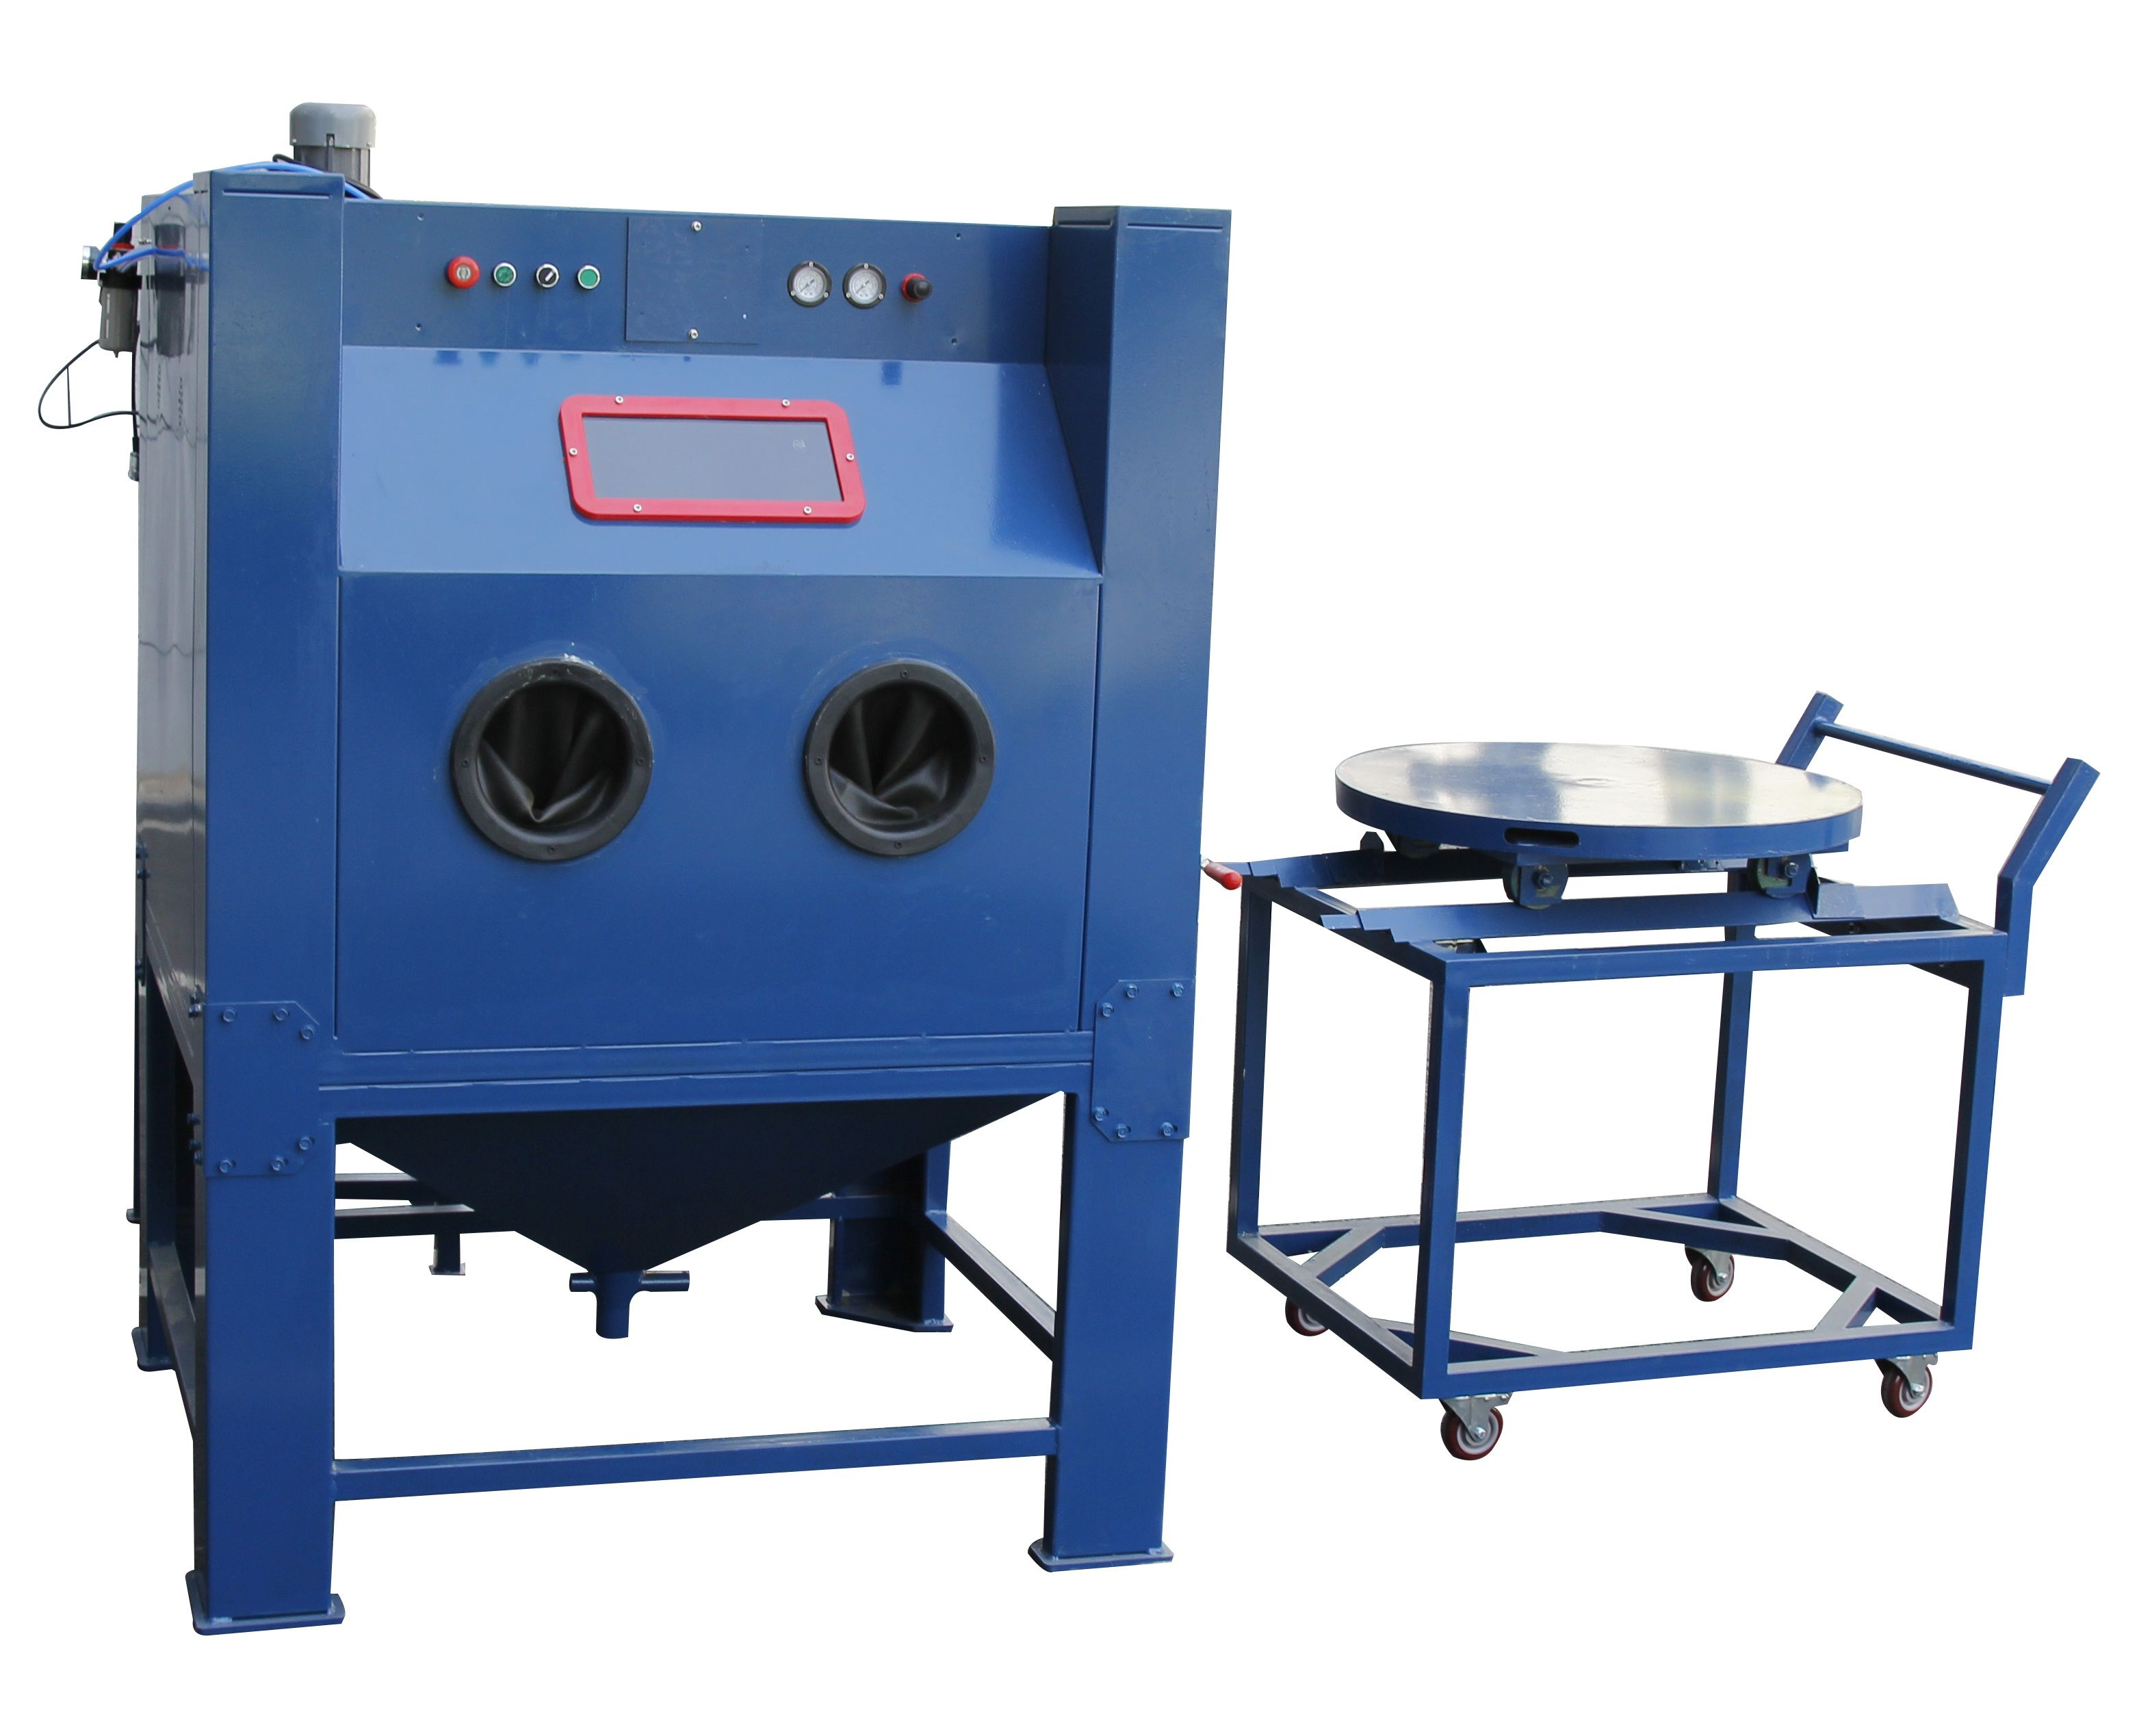 Manual sandblasting cabinet with turntable for easy operation.  #manualsandblalstingcabinet #drysandblastingcabinet #highqualityblastcabinet